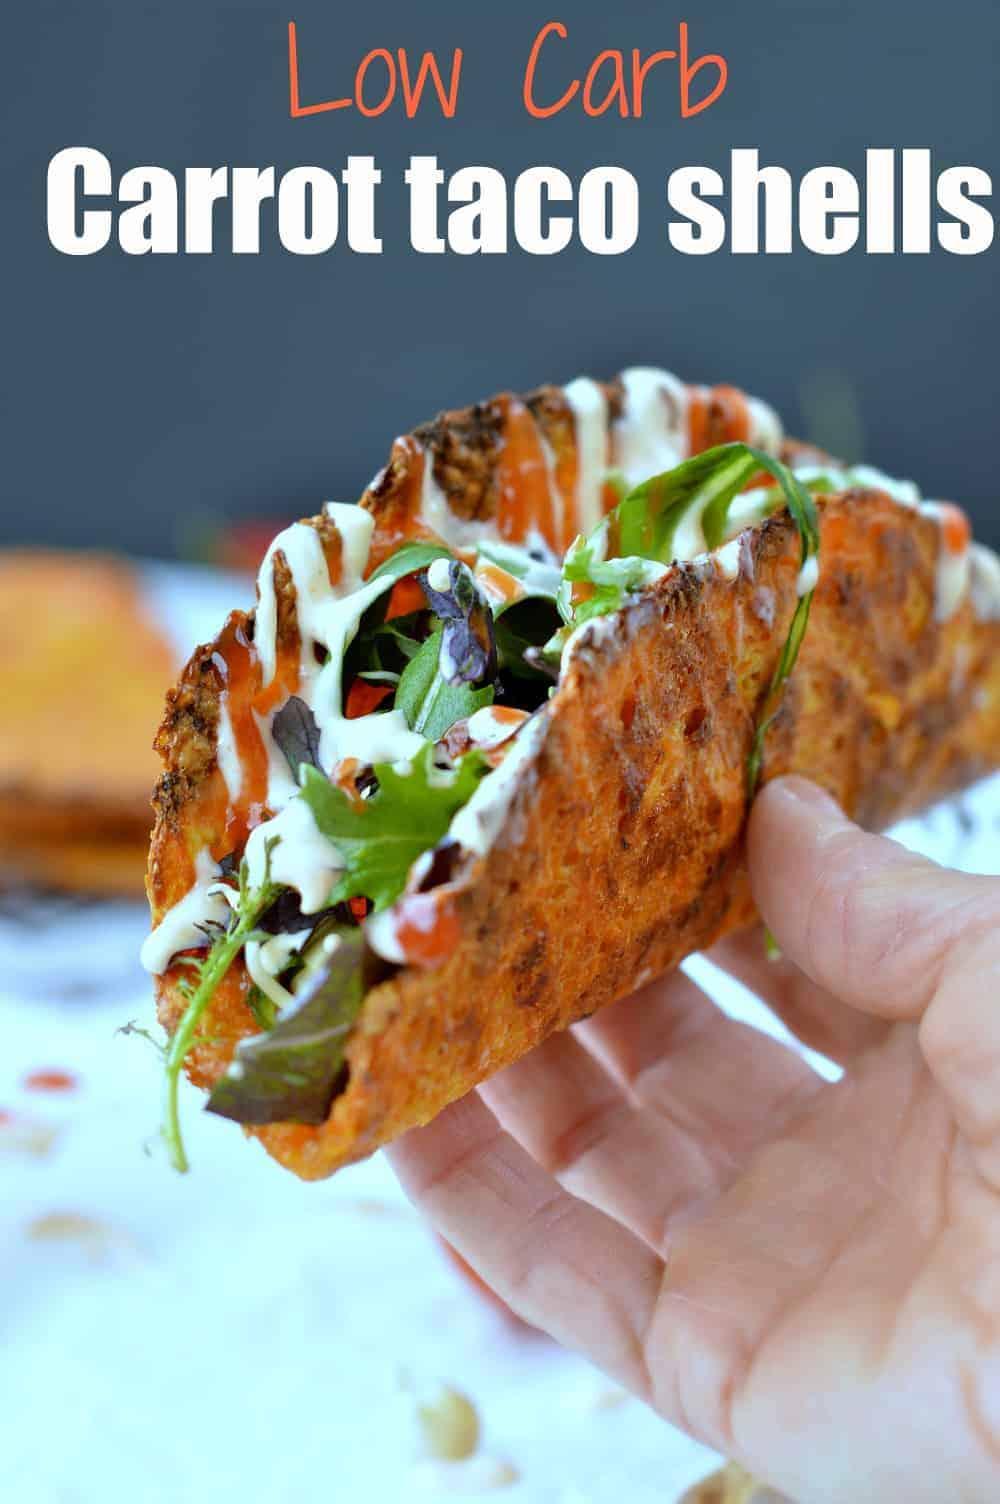 Carrot Taco Shells